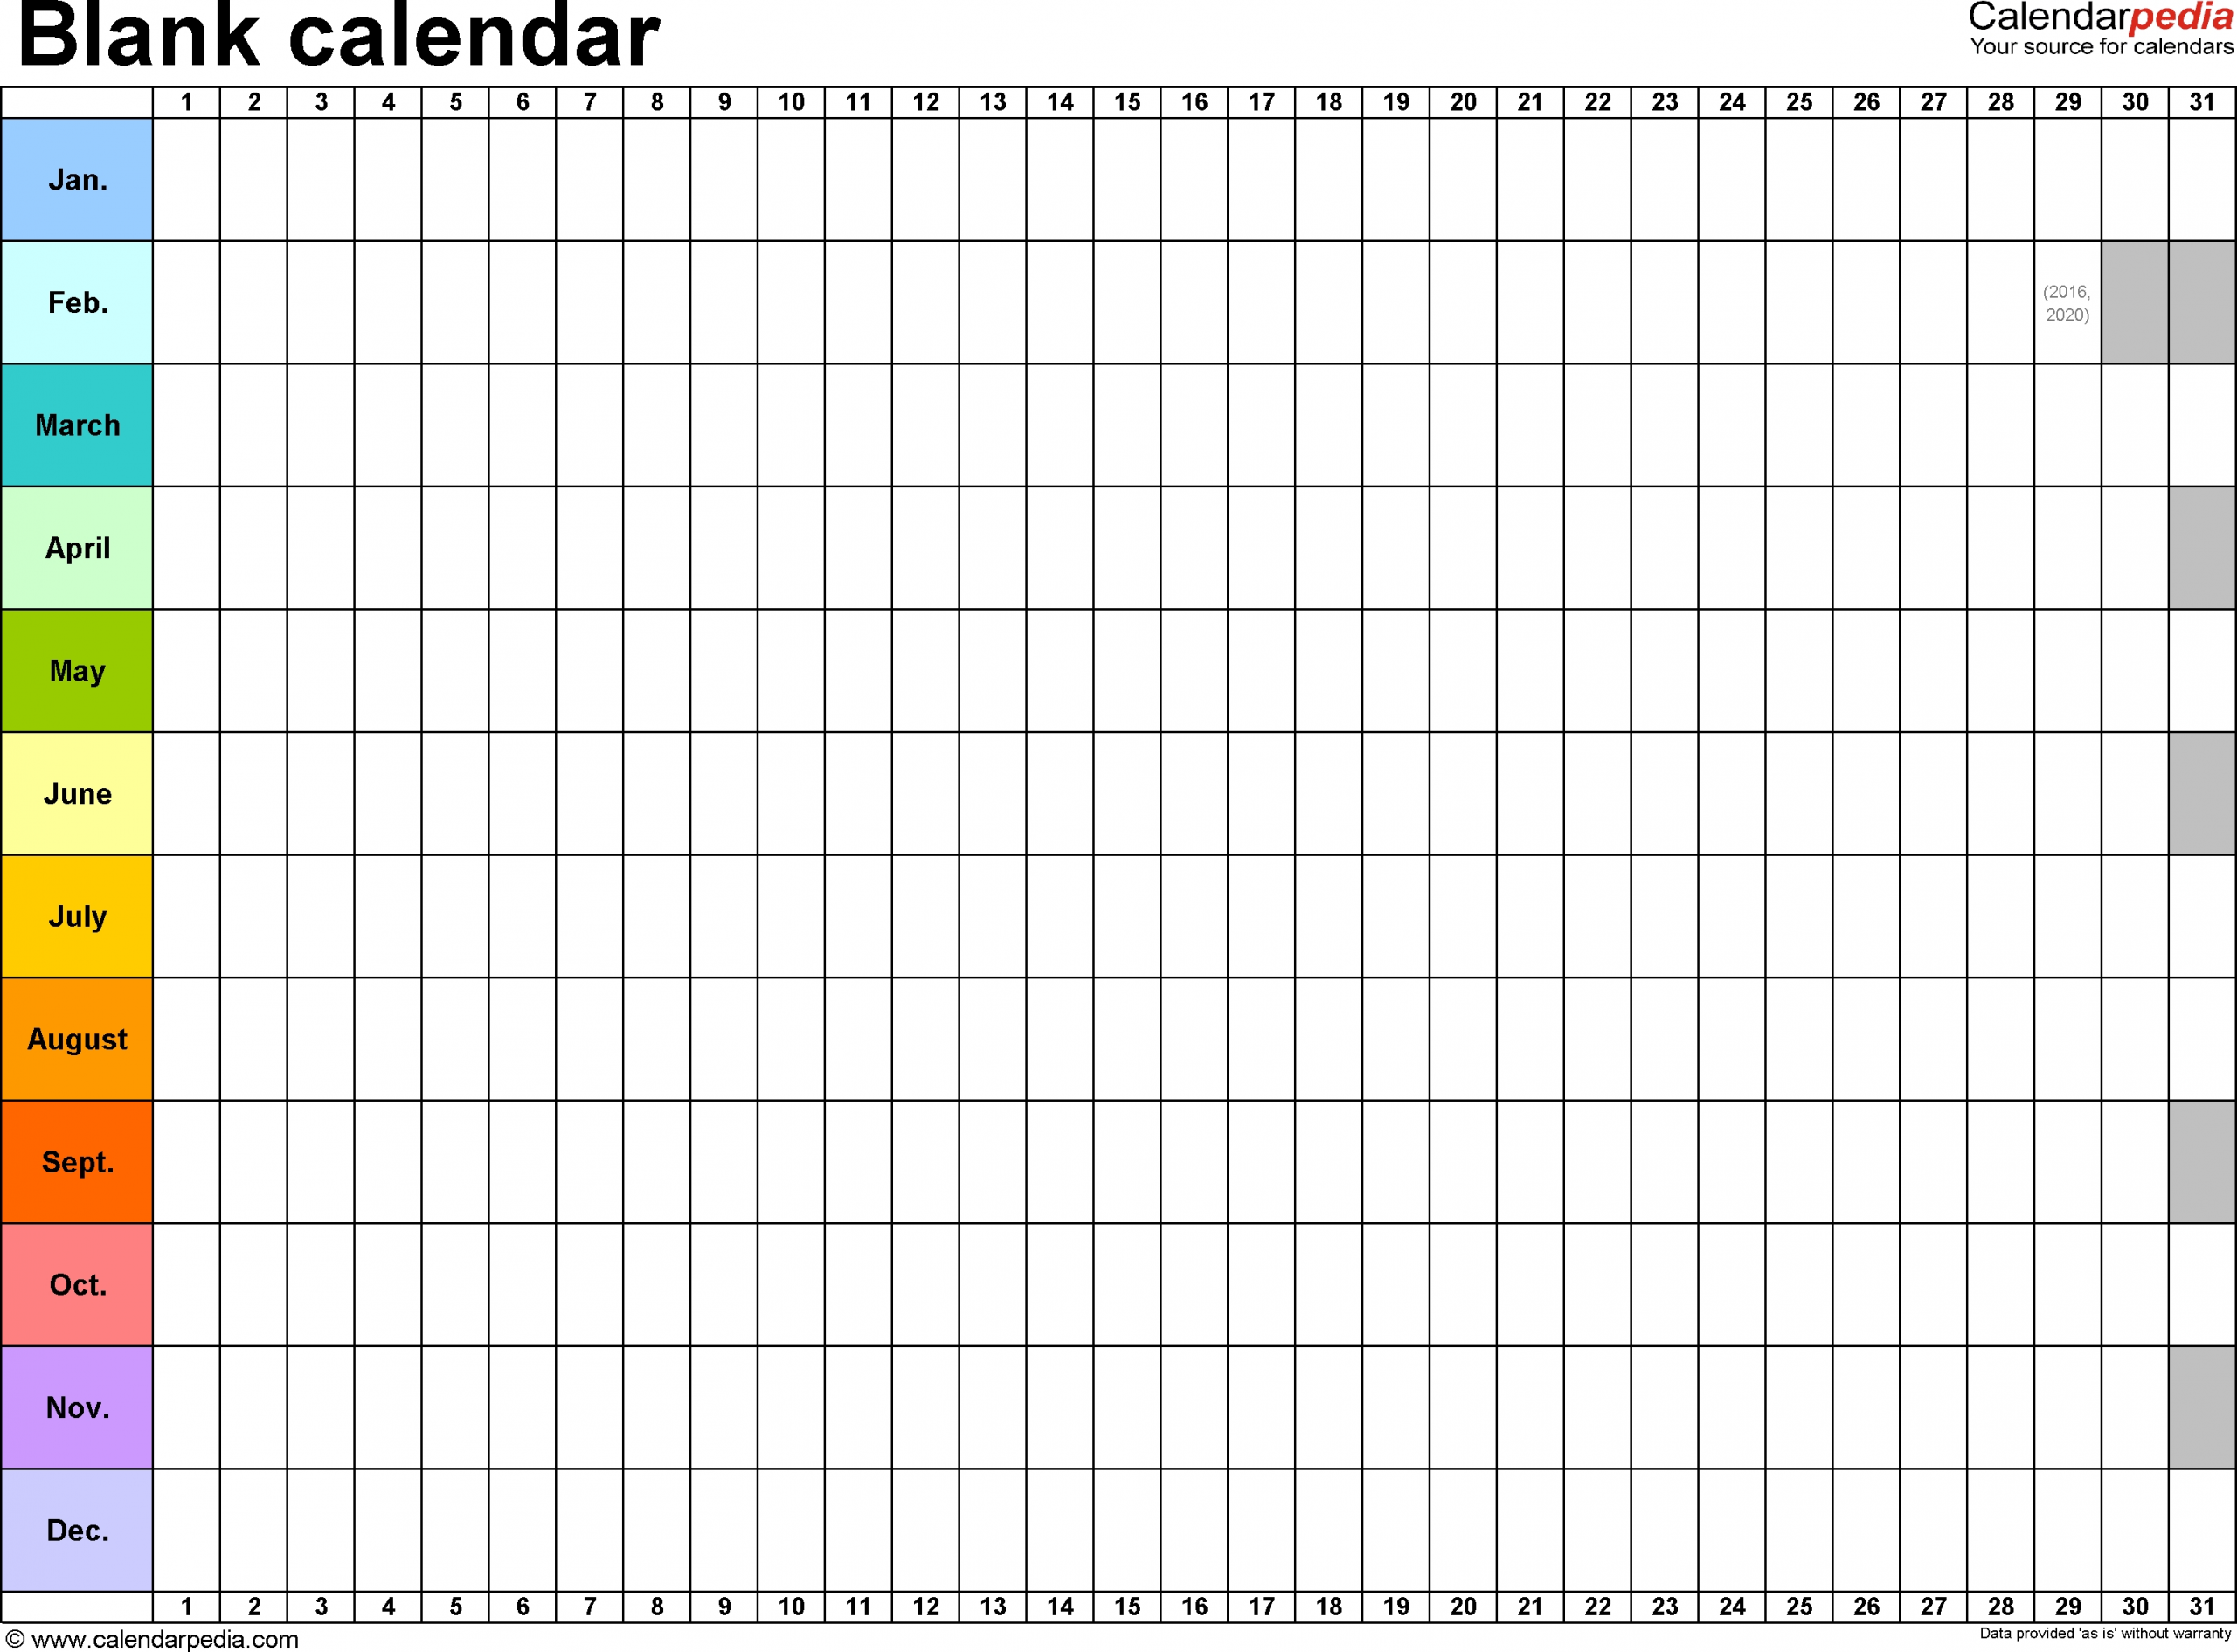 Blank Calendar Print Out | Blank Calendar Template